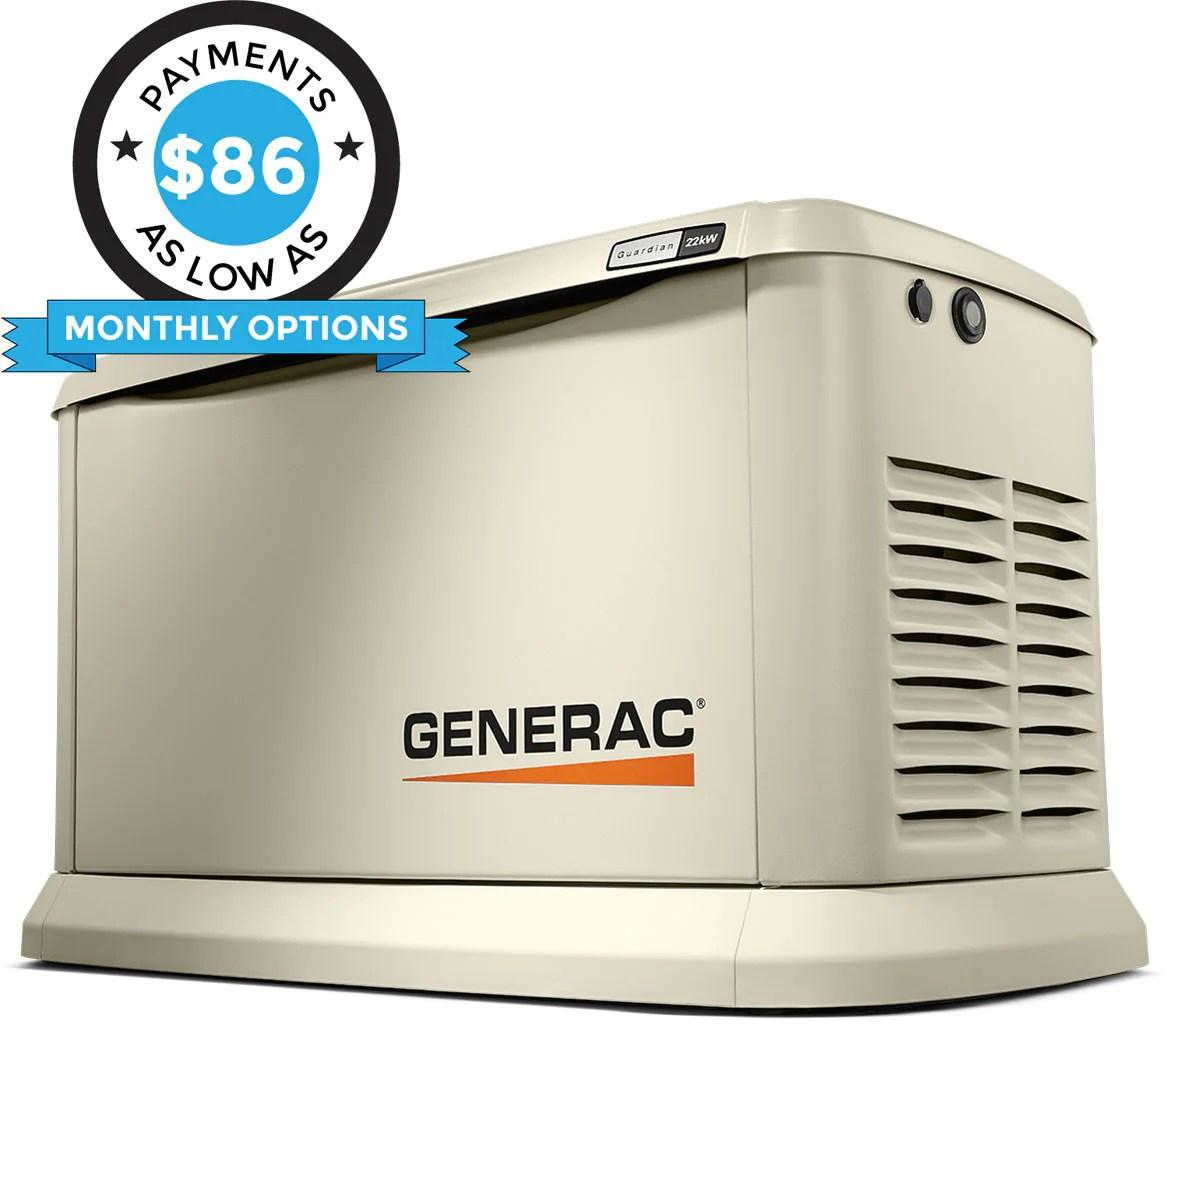 22kw Generac Generator Wiring Diagram - generac 7043